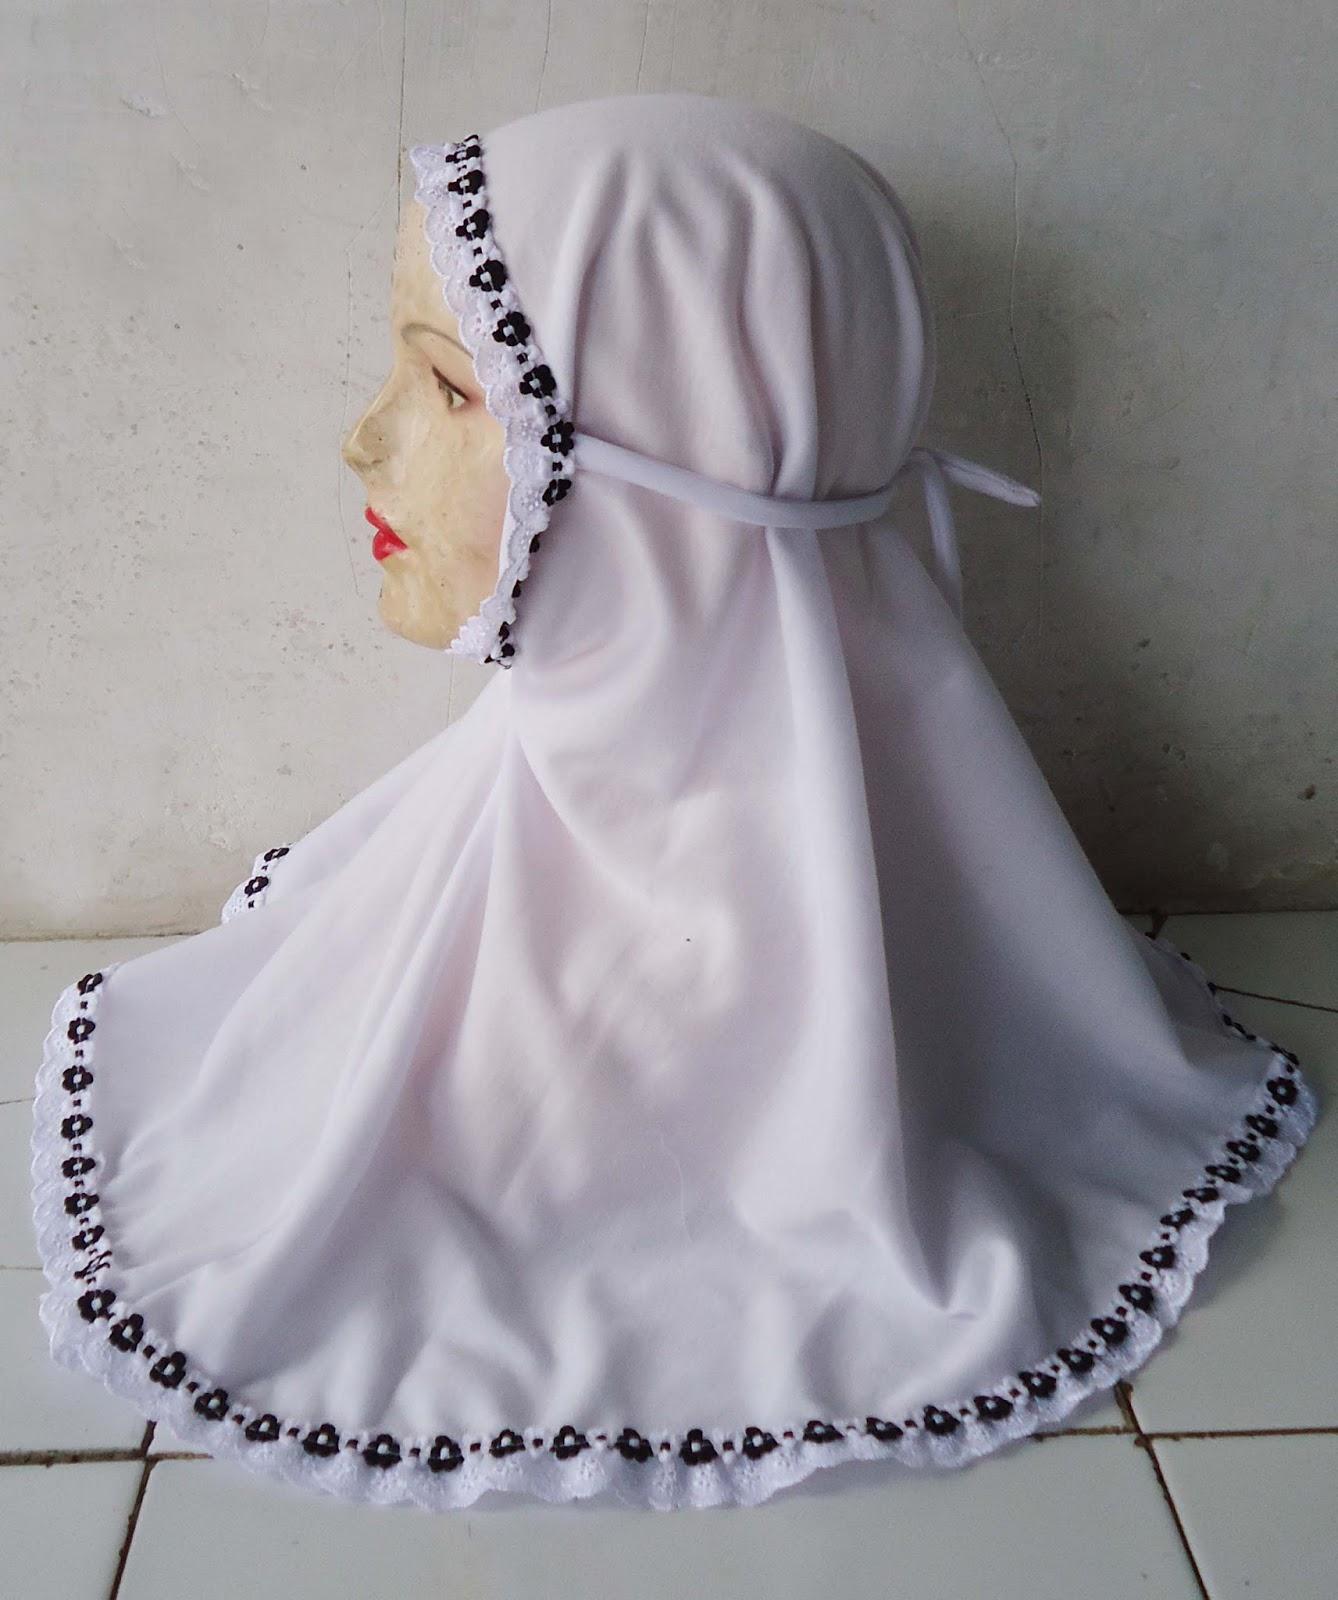 konveksi grosir jilbab seragam sekolah ra tk sd mi smp mts sma ma murah konveksi seragam. Black Bedroom Furniture Sets. Home Design Ideas